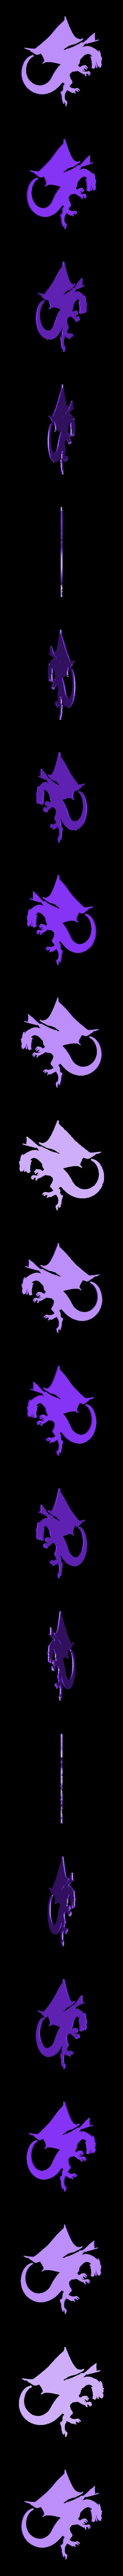 game_of_thrones__dragon_3dprintny.stl Download free STL file Dragons for Everyone! • 3D printing design, barb_3dprintny